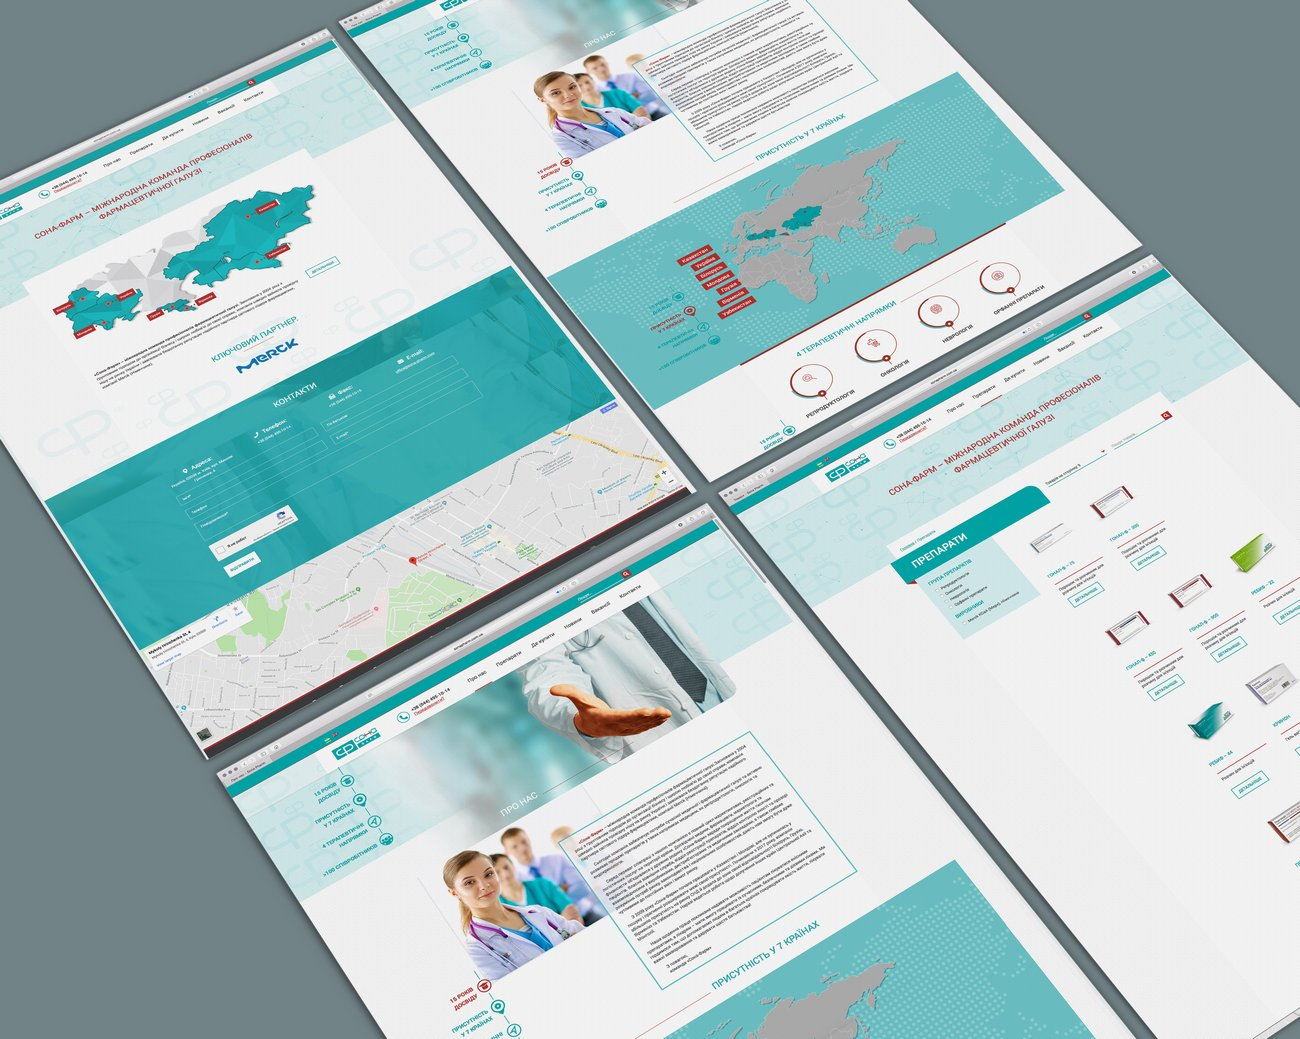 Corporate website development for Sona-Pharm pharmaceutical company portfolio